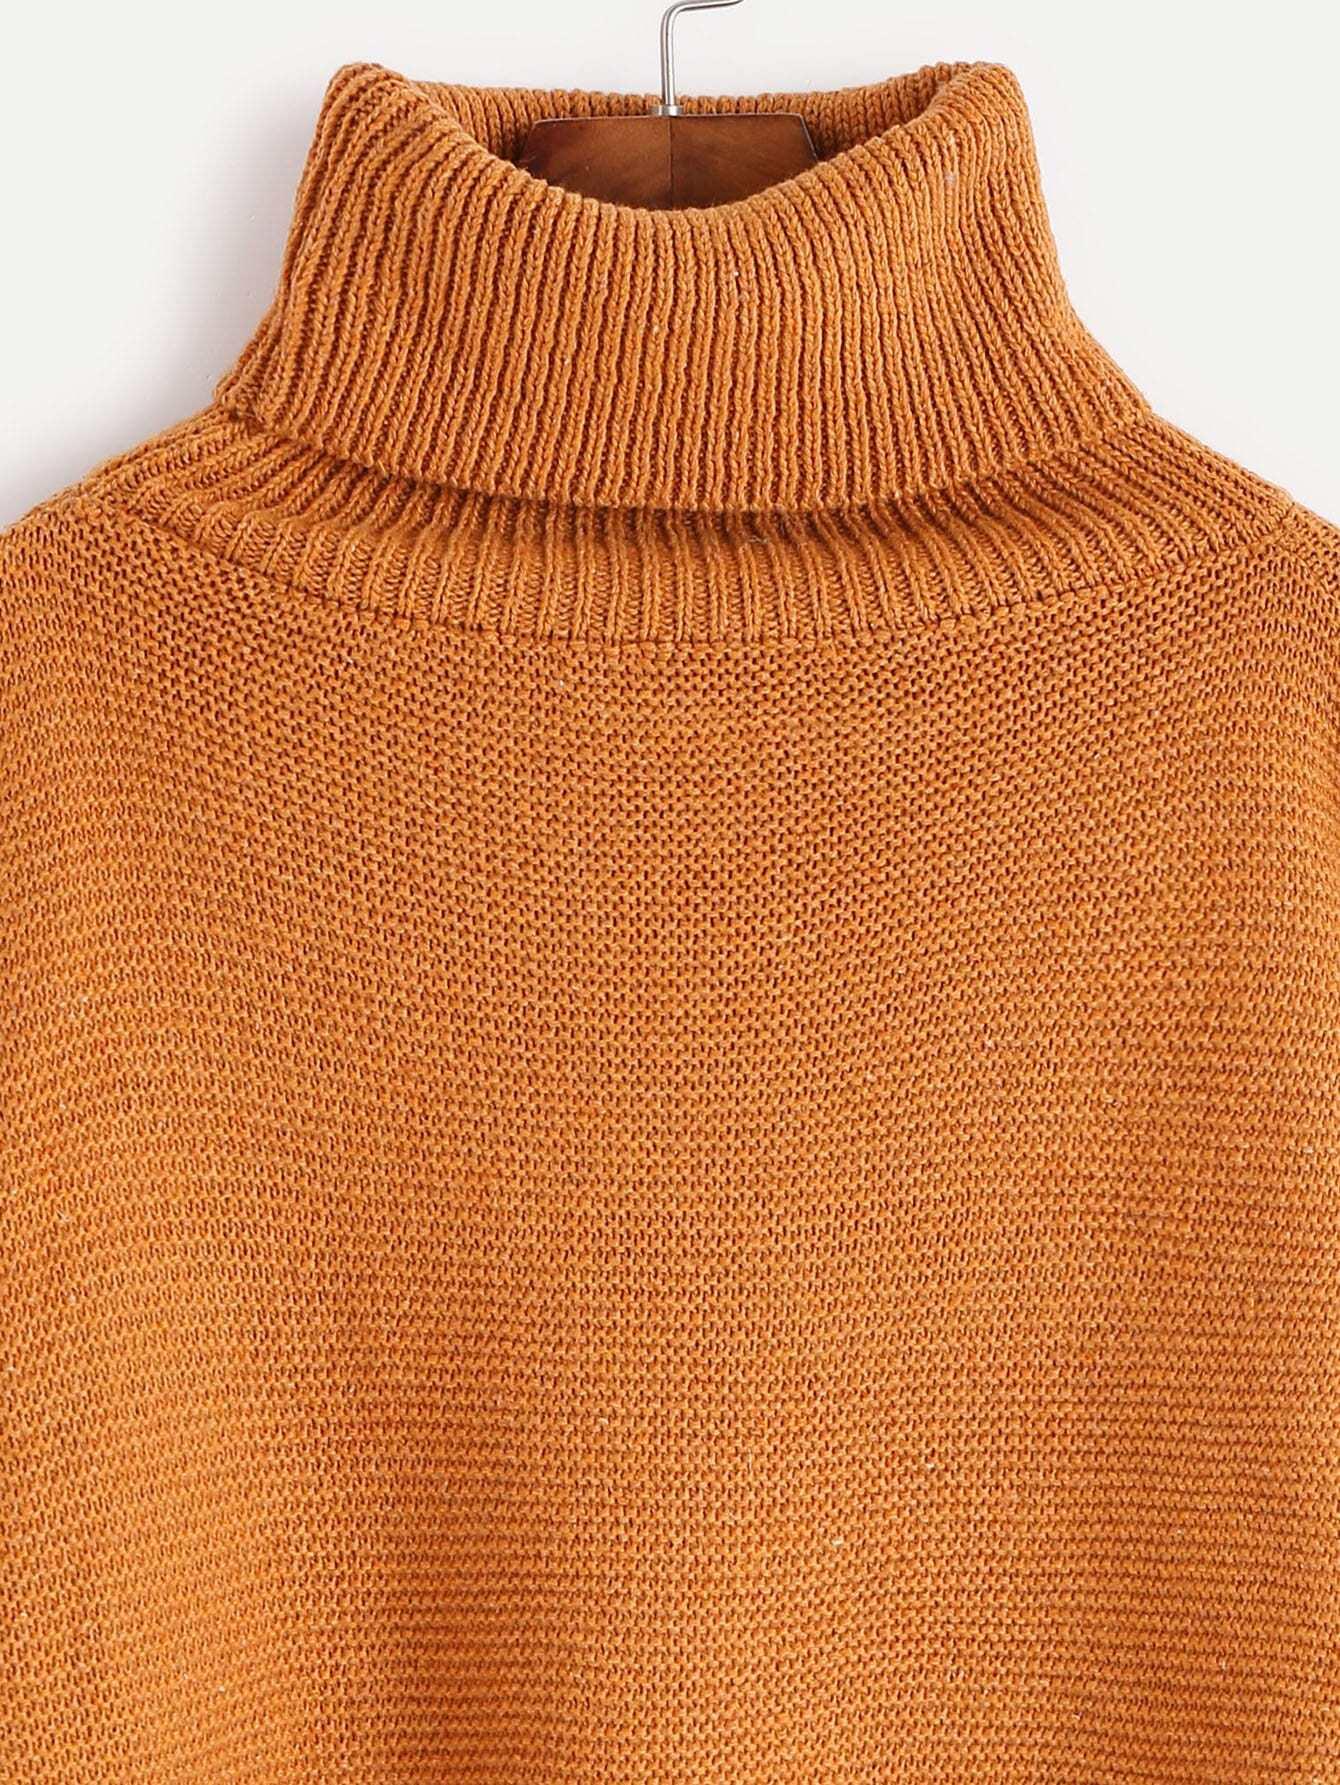 sweater161025134_2